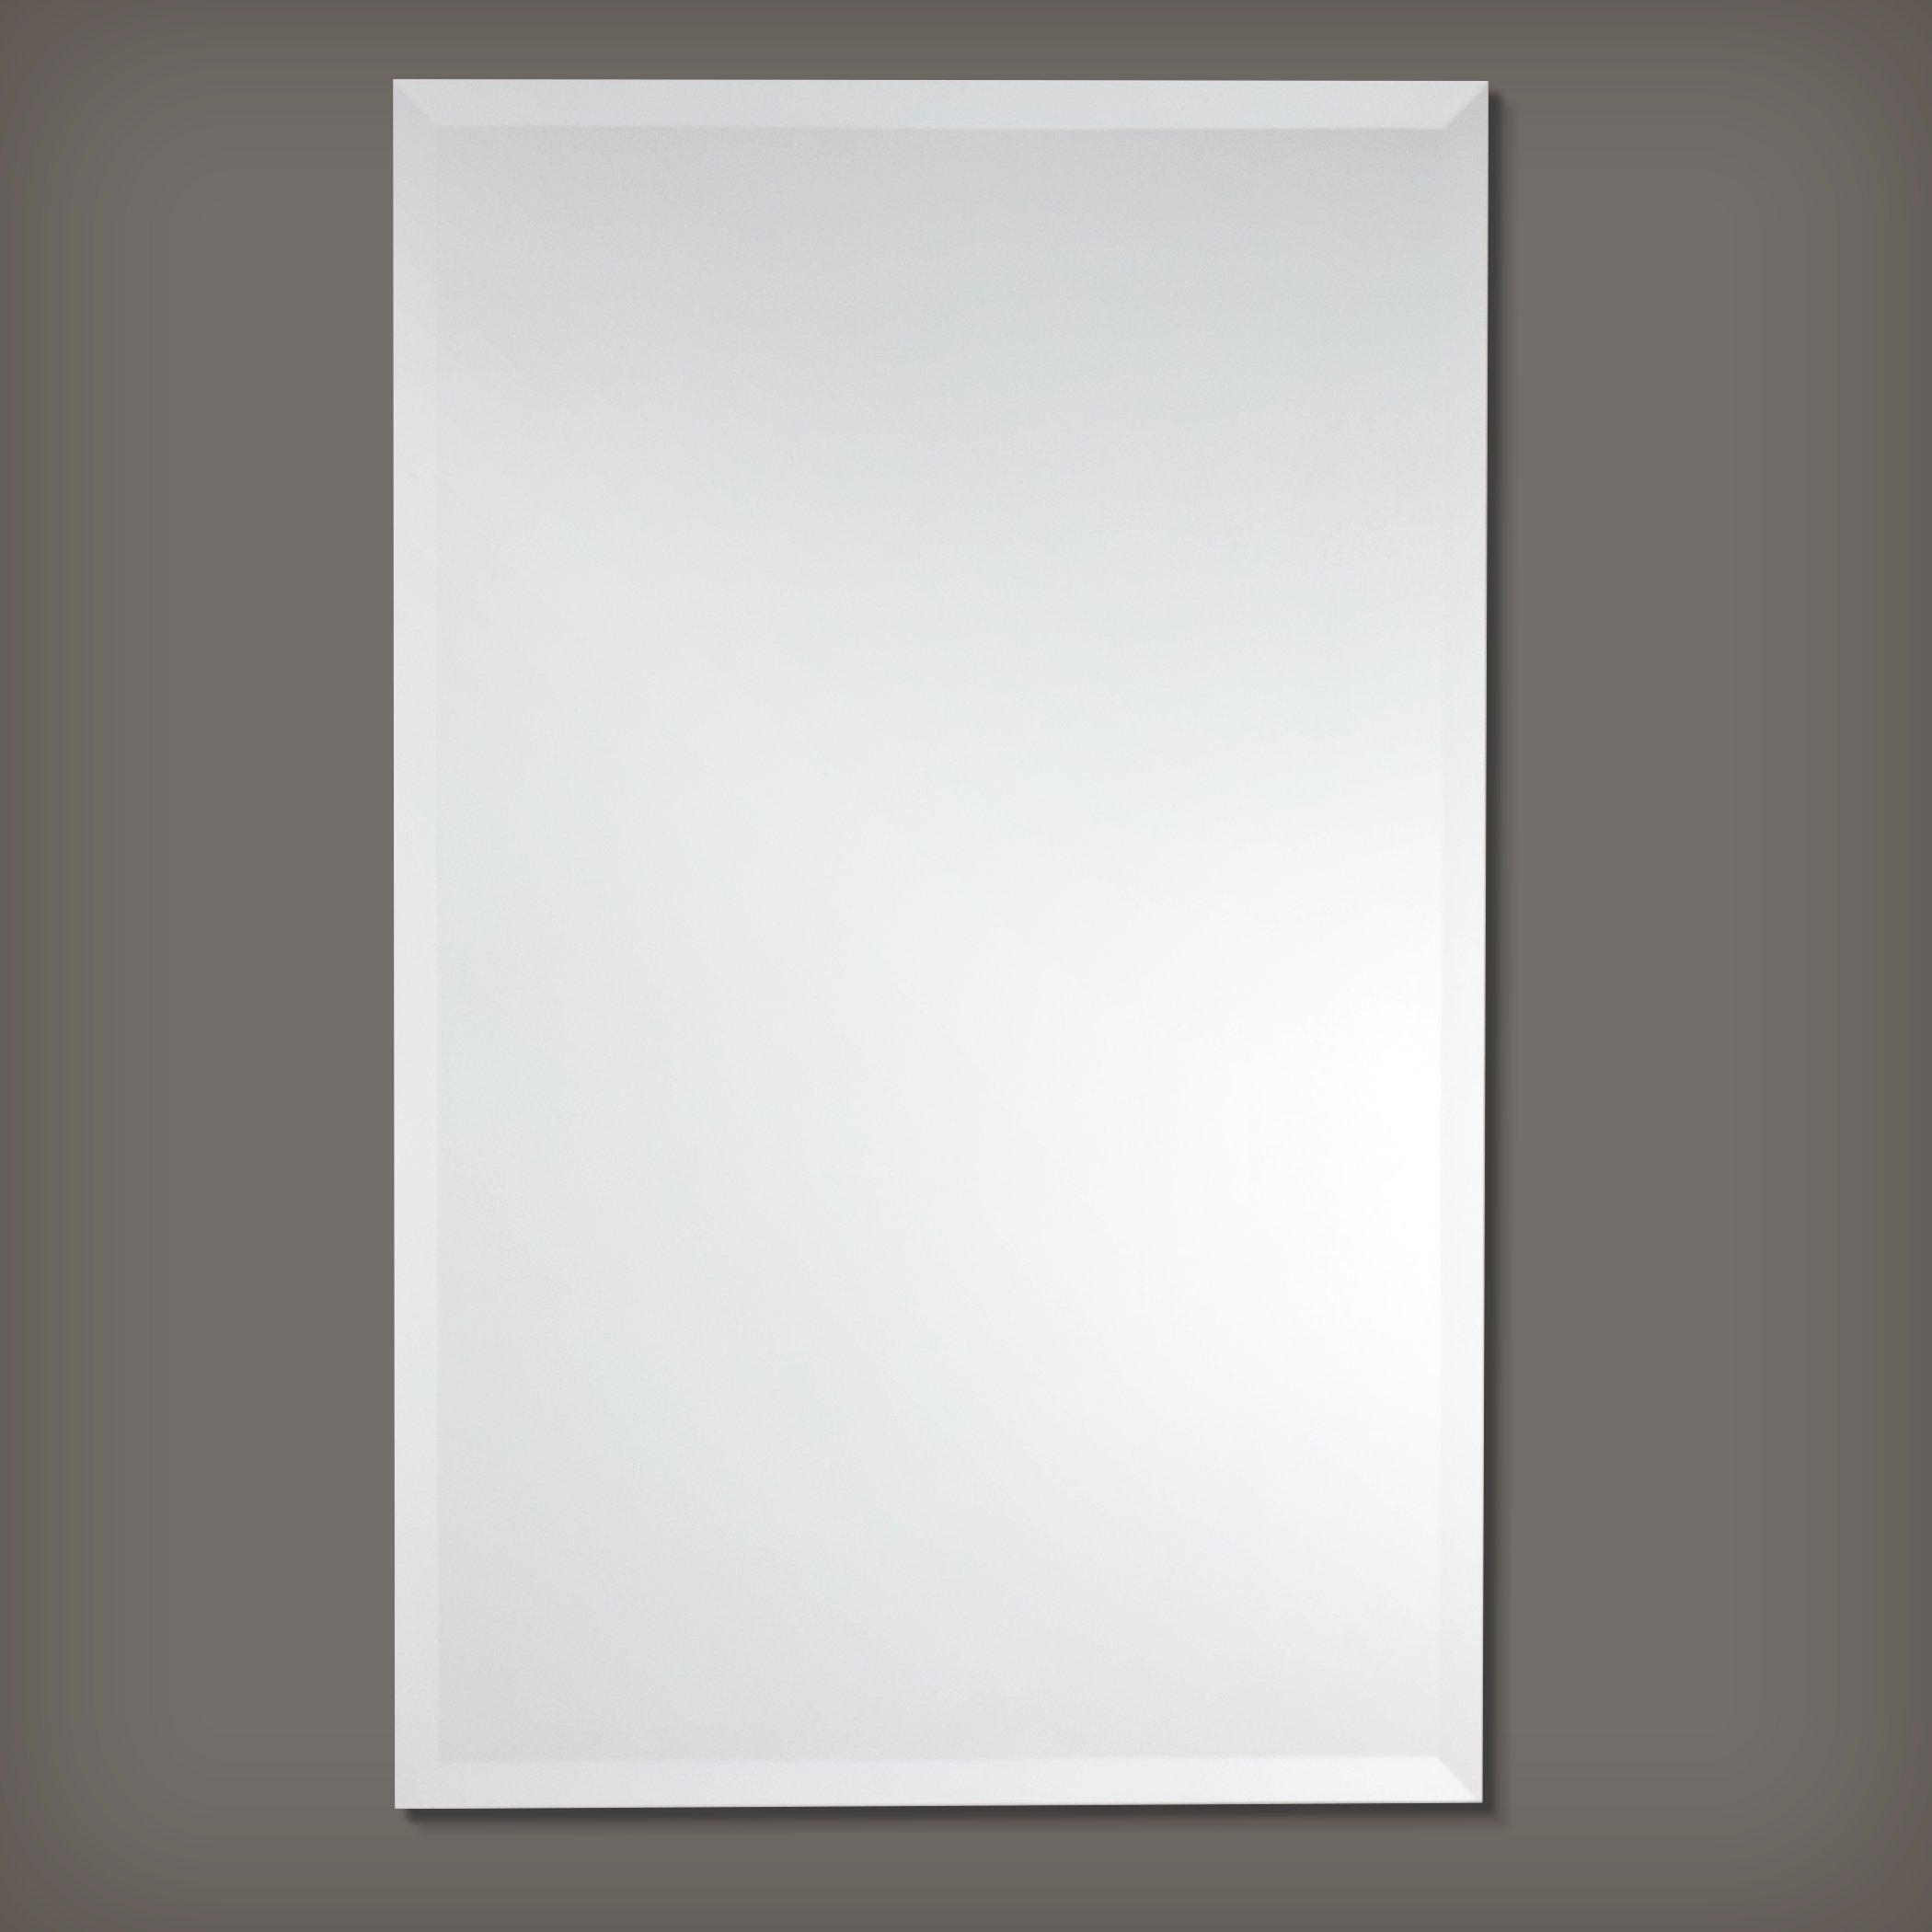 Frameless Rectangle Wall Mirror | Bathroom, Vanity, Bedroom ...